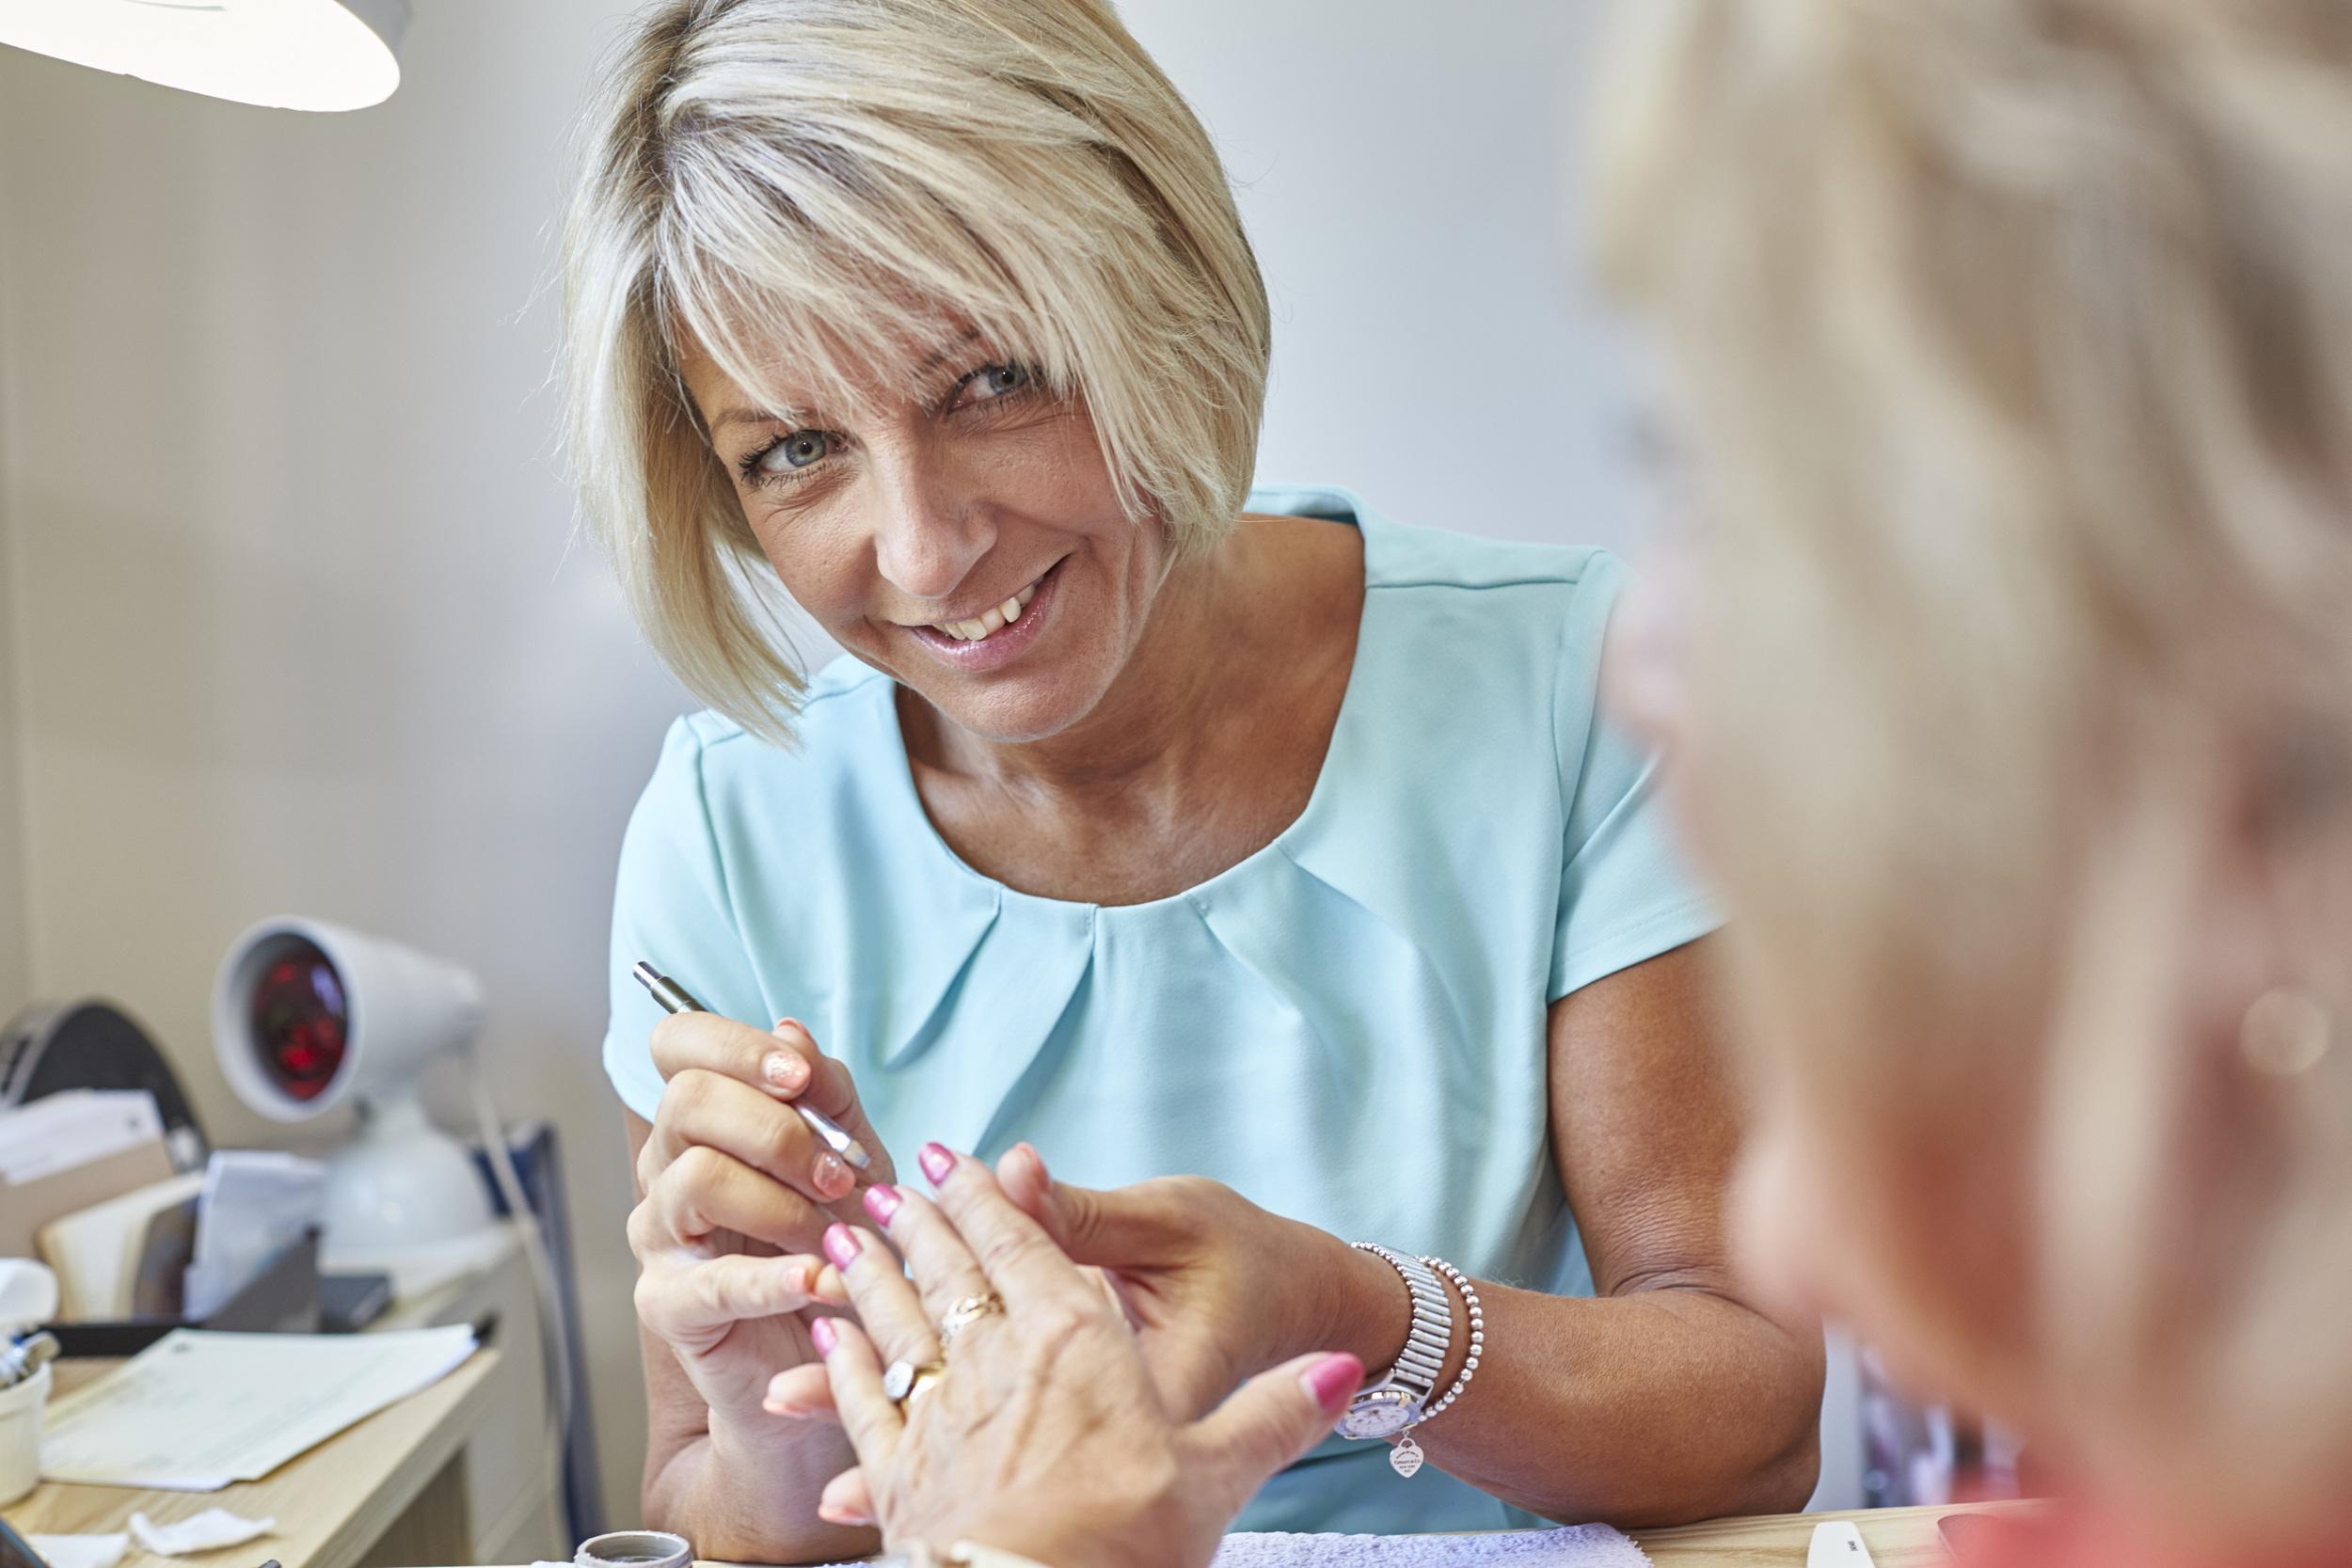 Manicure with BioSculpture Gels